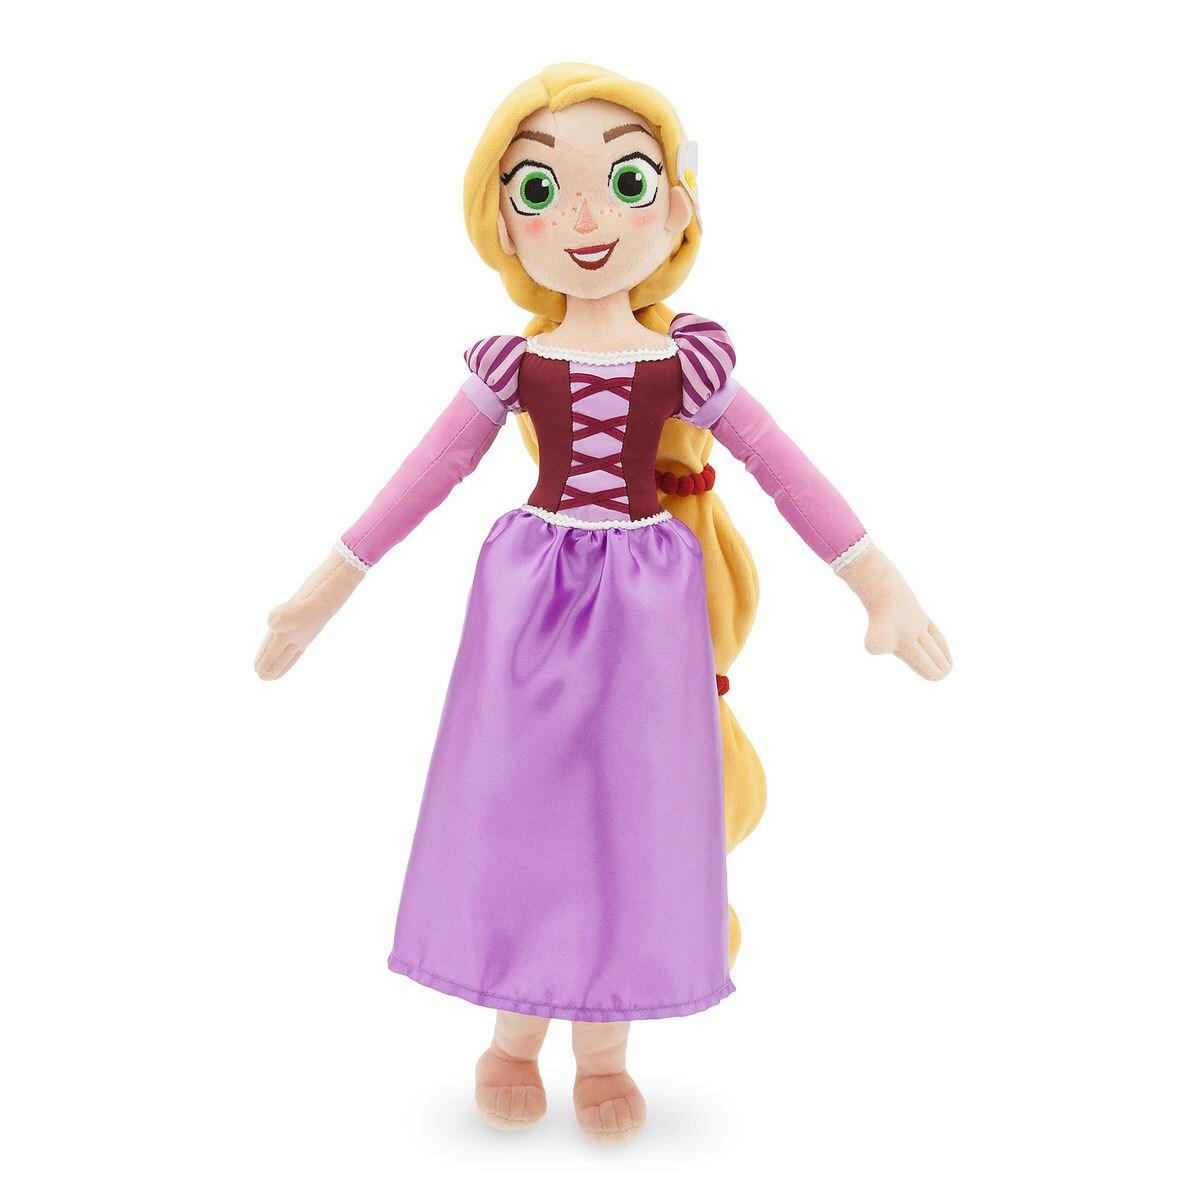 Rapunzel Plush Doll - Tangled the Series - Medium - 19\'\' | shopDisney